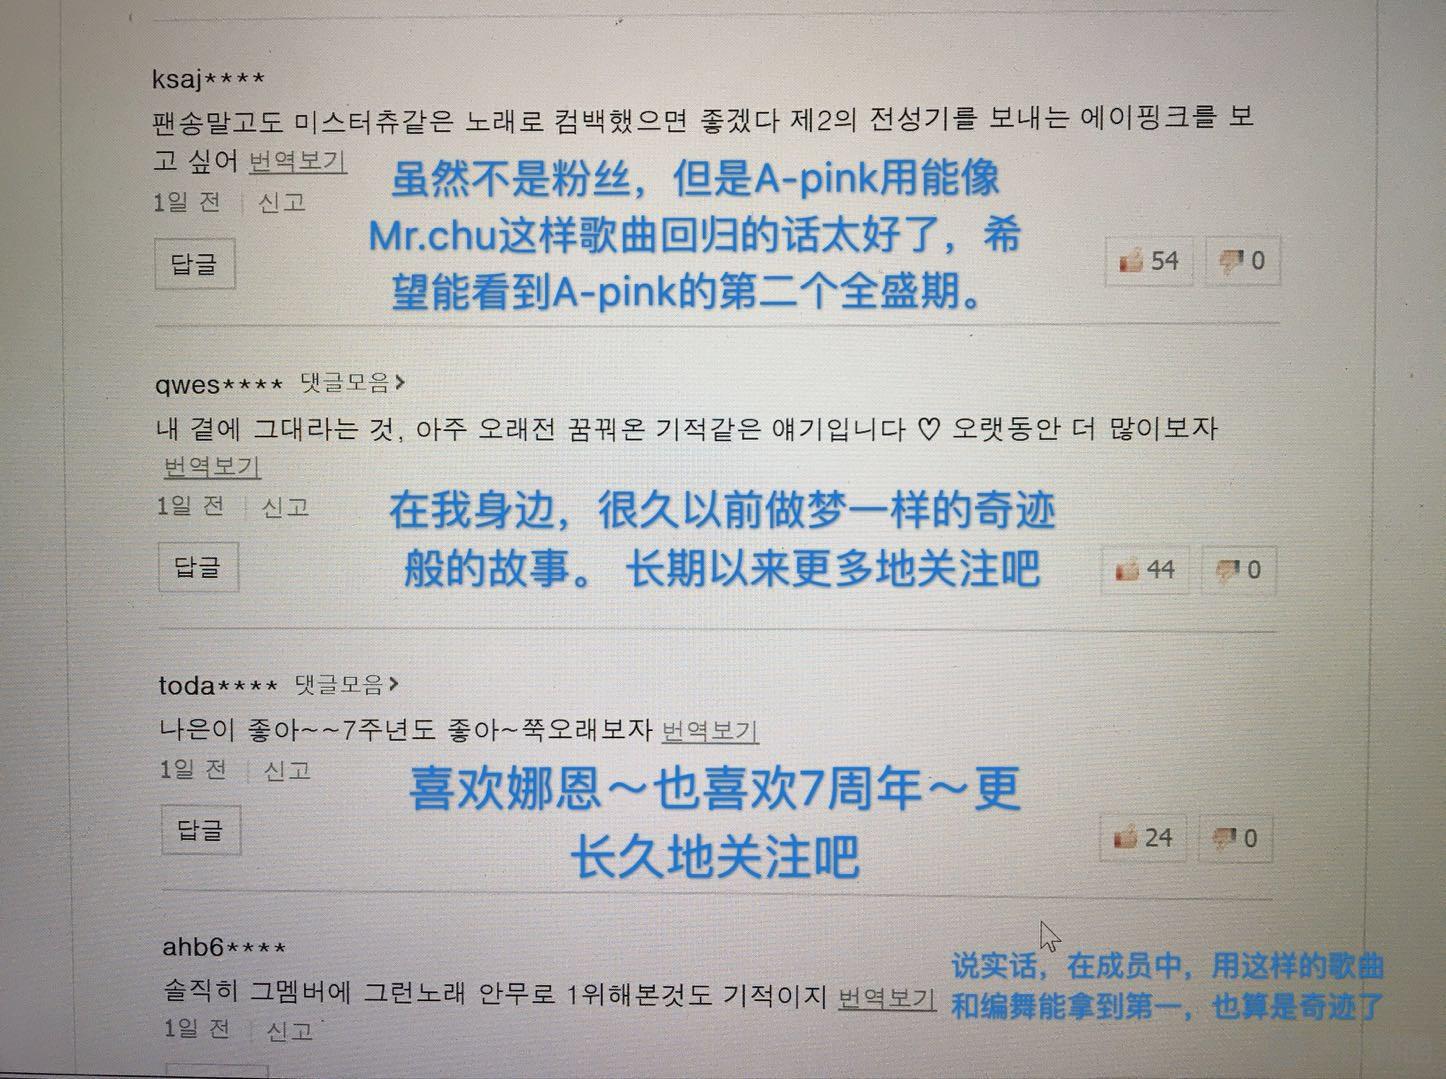 apink 7周年:我们再一次创造奇迹吧_沪江韩语学习网